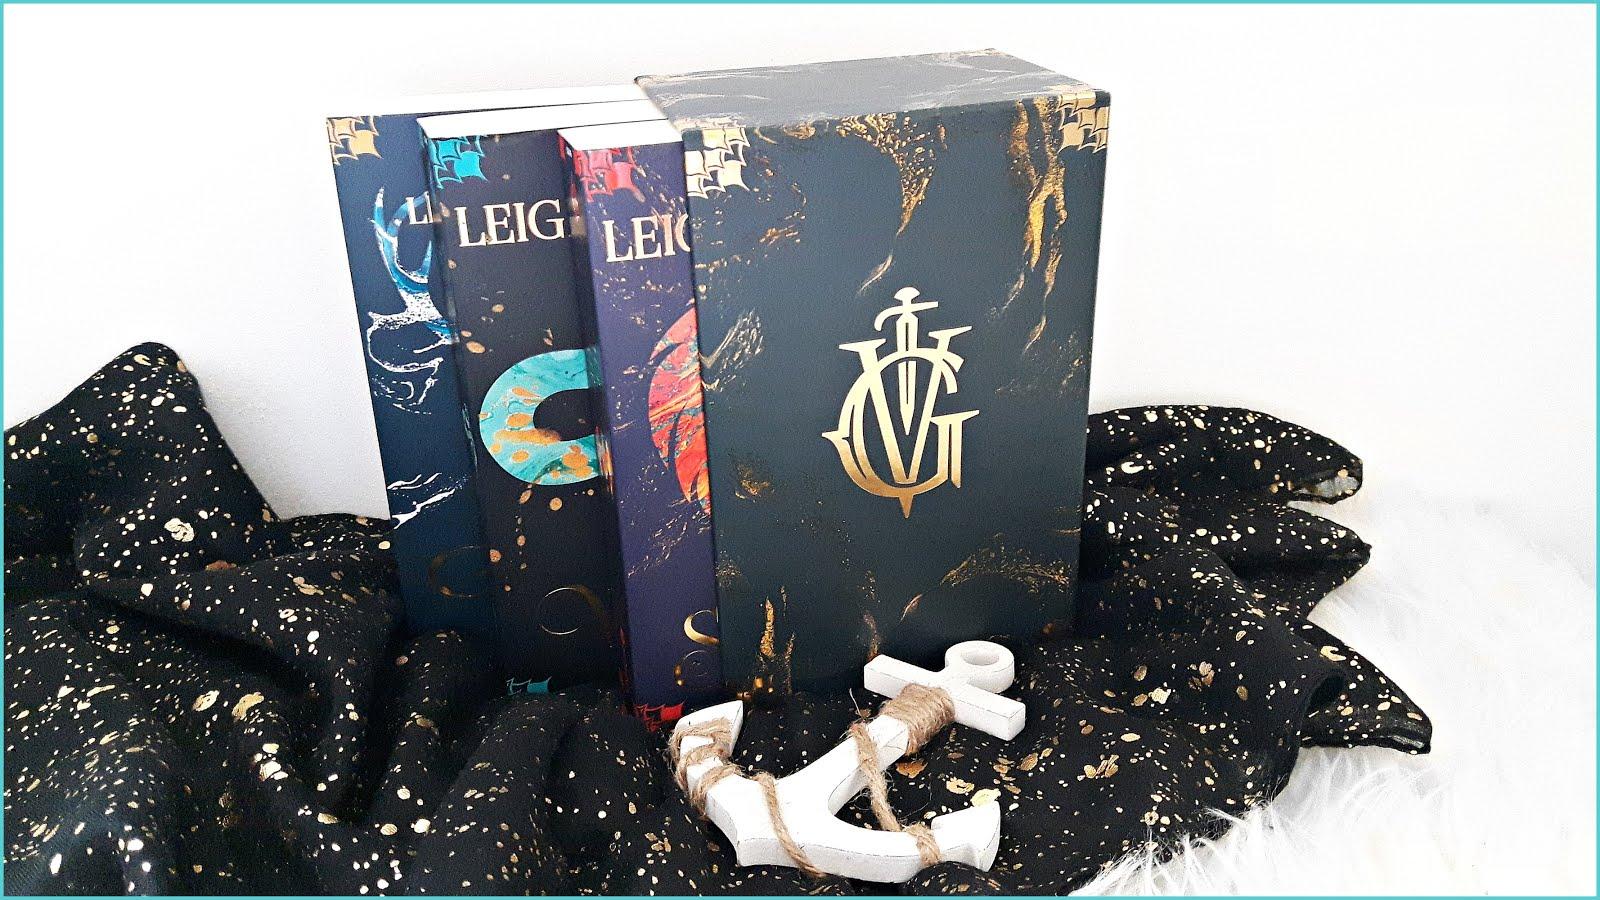 Grisha Verse Grischa Trilogie Schuber Leigh Bardugo Droemer Knaur King of Scars Russland Krähen Glory or Grave